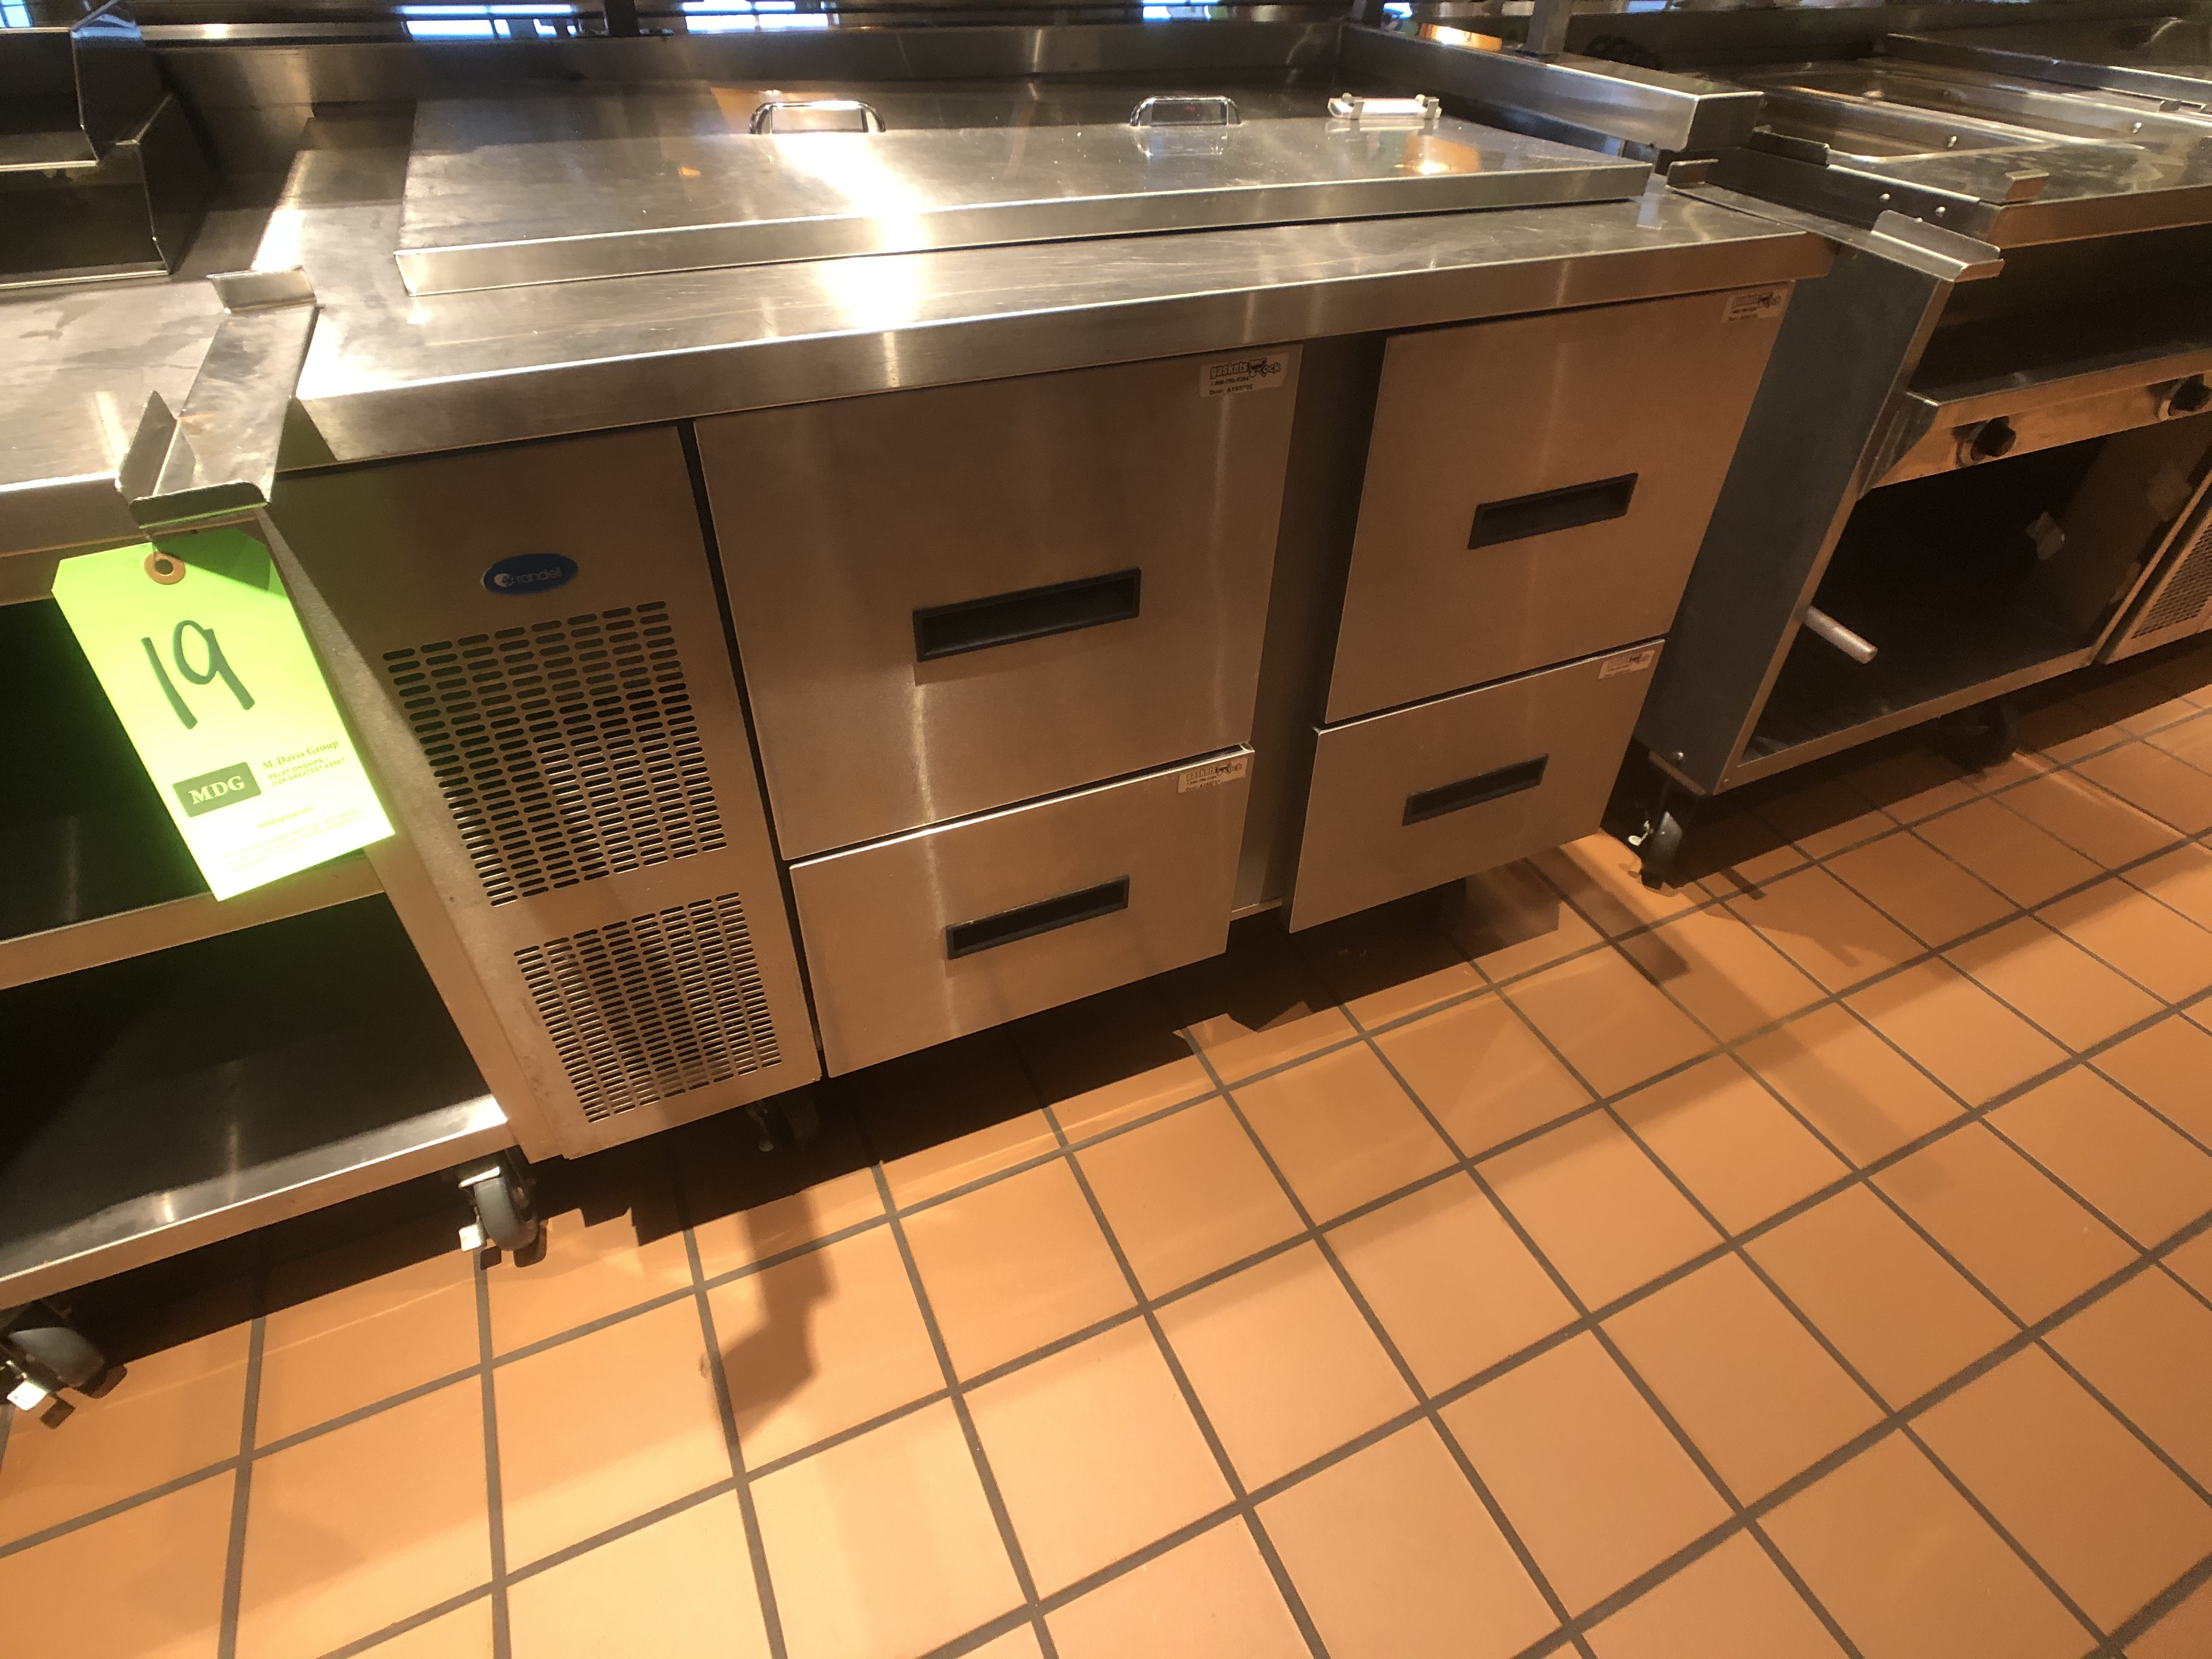 "Randell Refrigerator / Sandwich Prep Table, Model 9030K-7, S/N W1035669-1, 48"" W x 33"" D36"" H - Image 2 of 5"